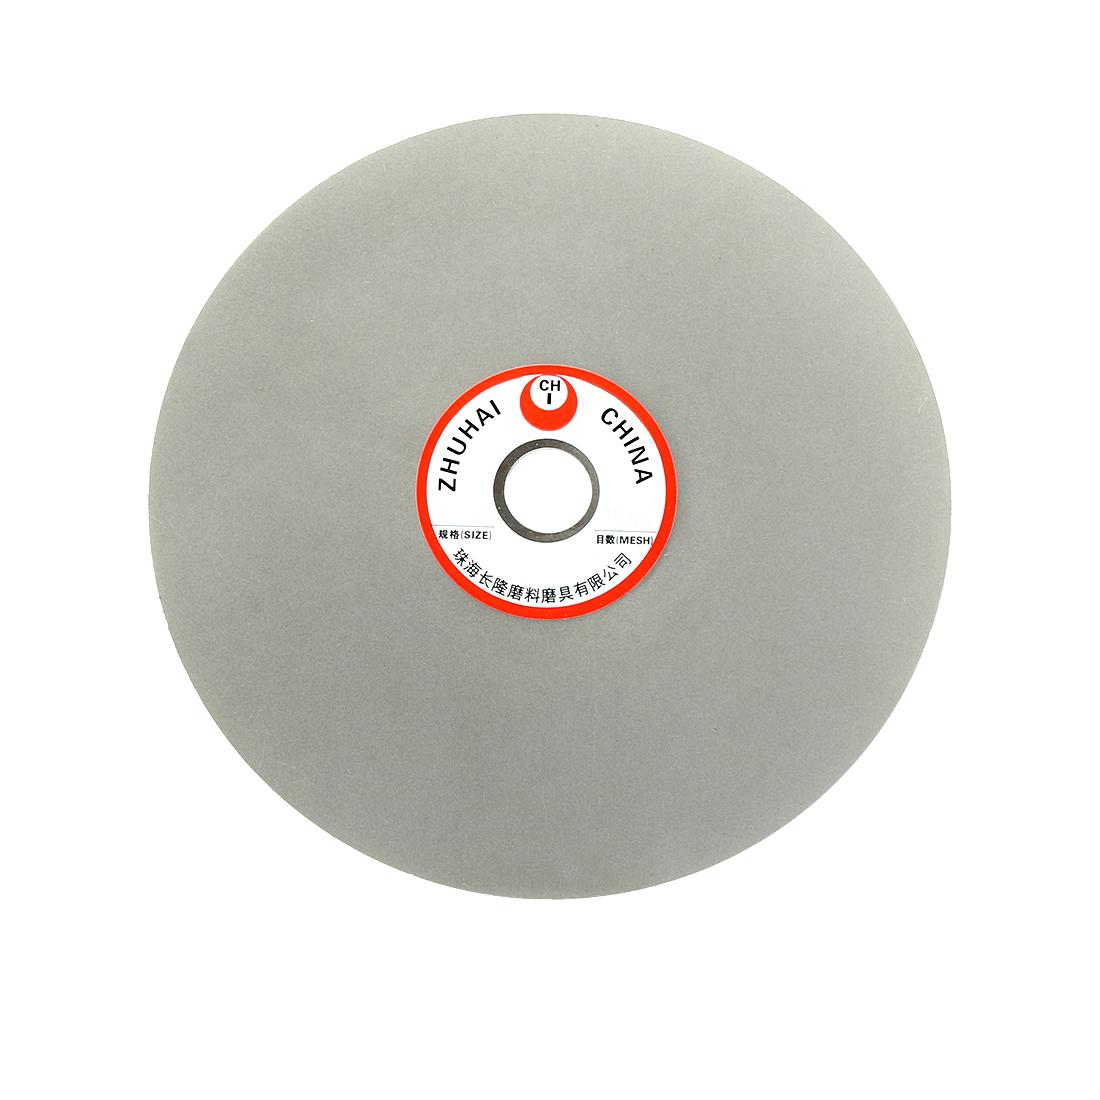 6-inch Grit 1500 Diamond Coated Flat Lap Wheel Grinding Disc Polishing Tool